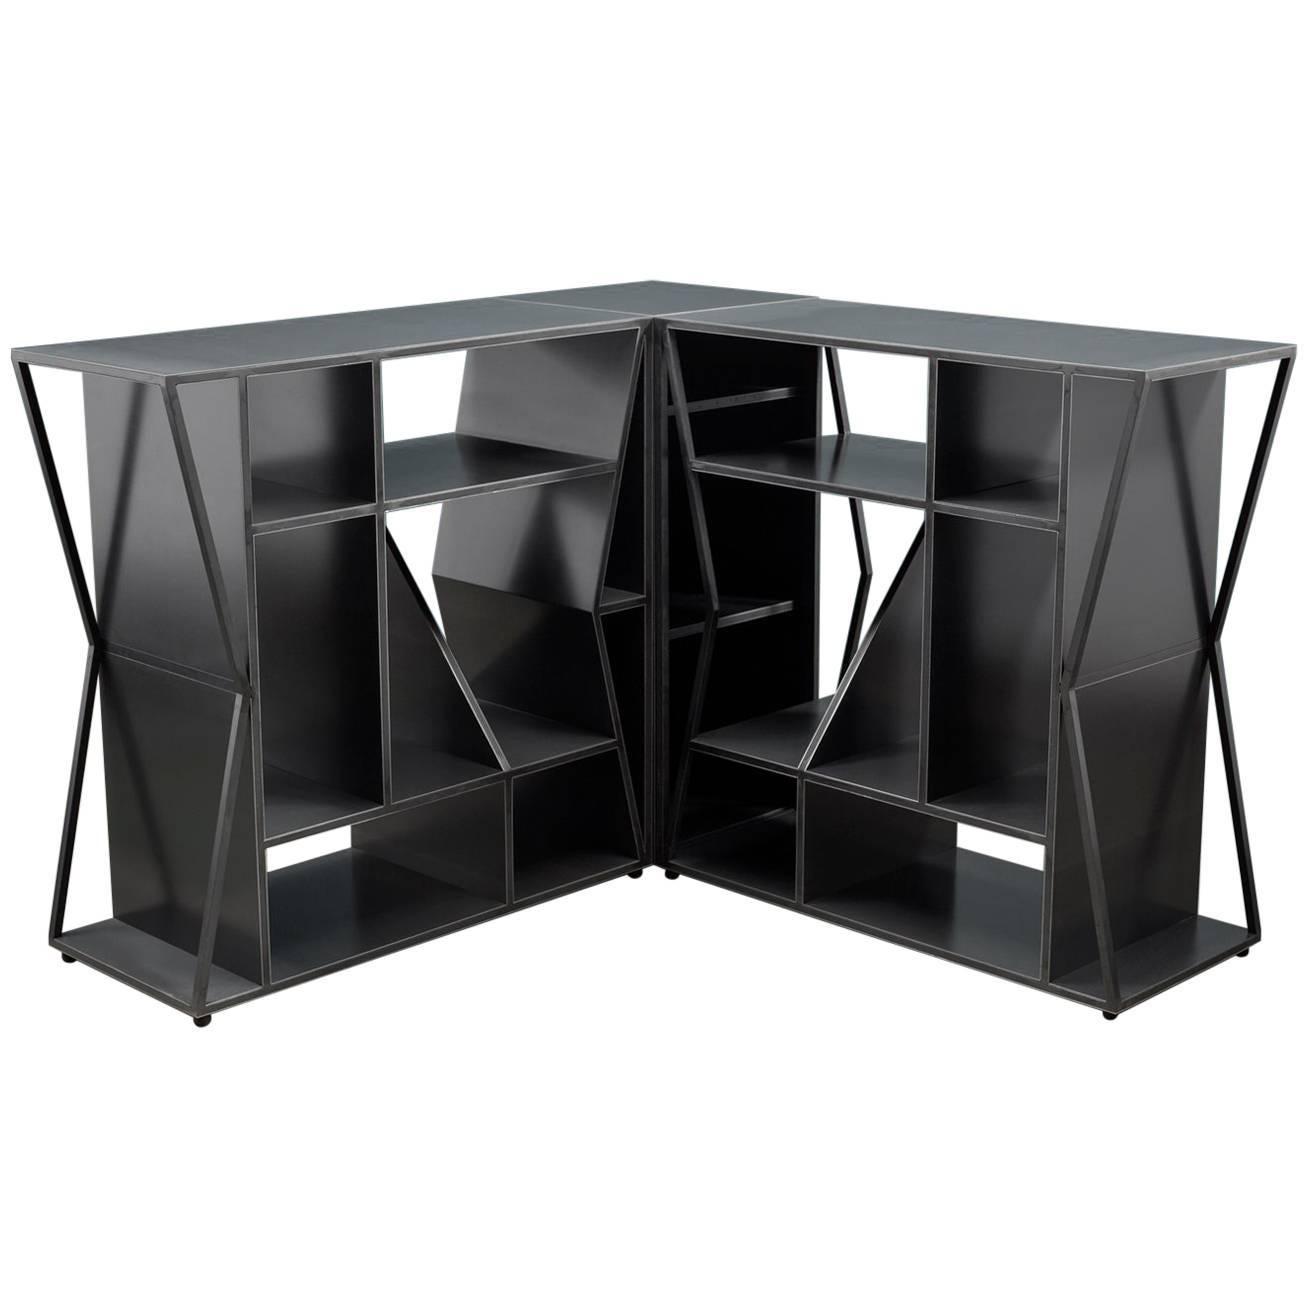 Modern Steel Corner Cabinet Trio, Meridian Modular Credenza, Force/Collide,  2017